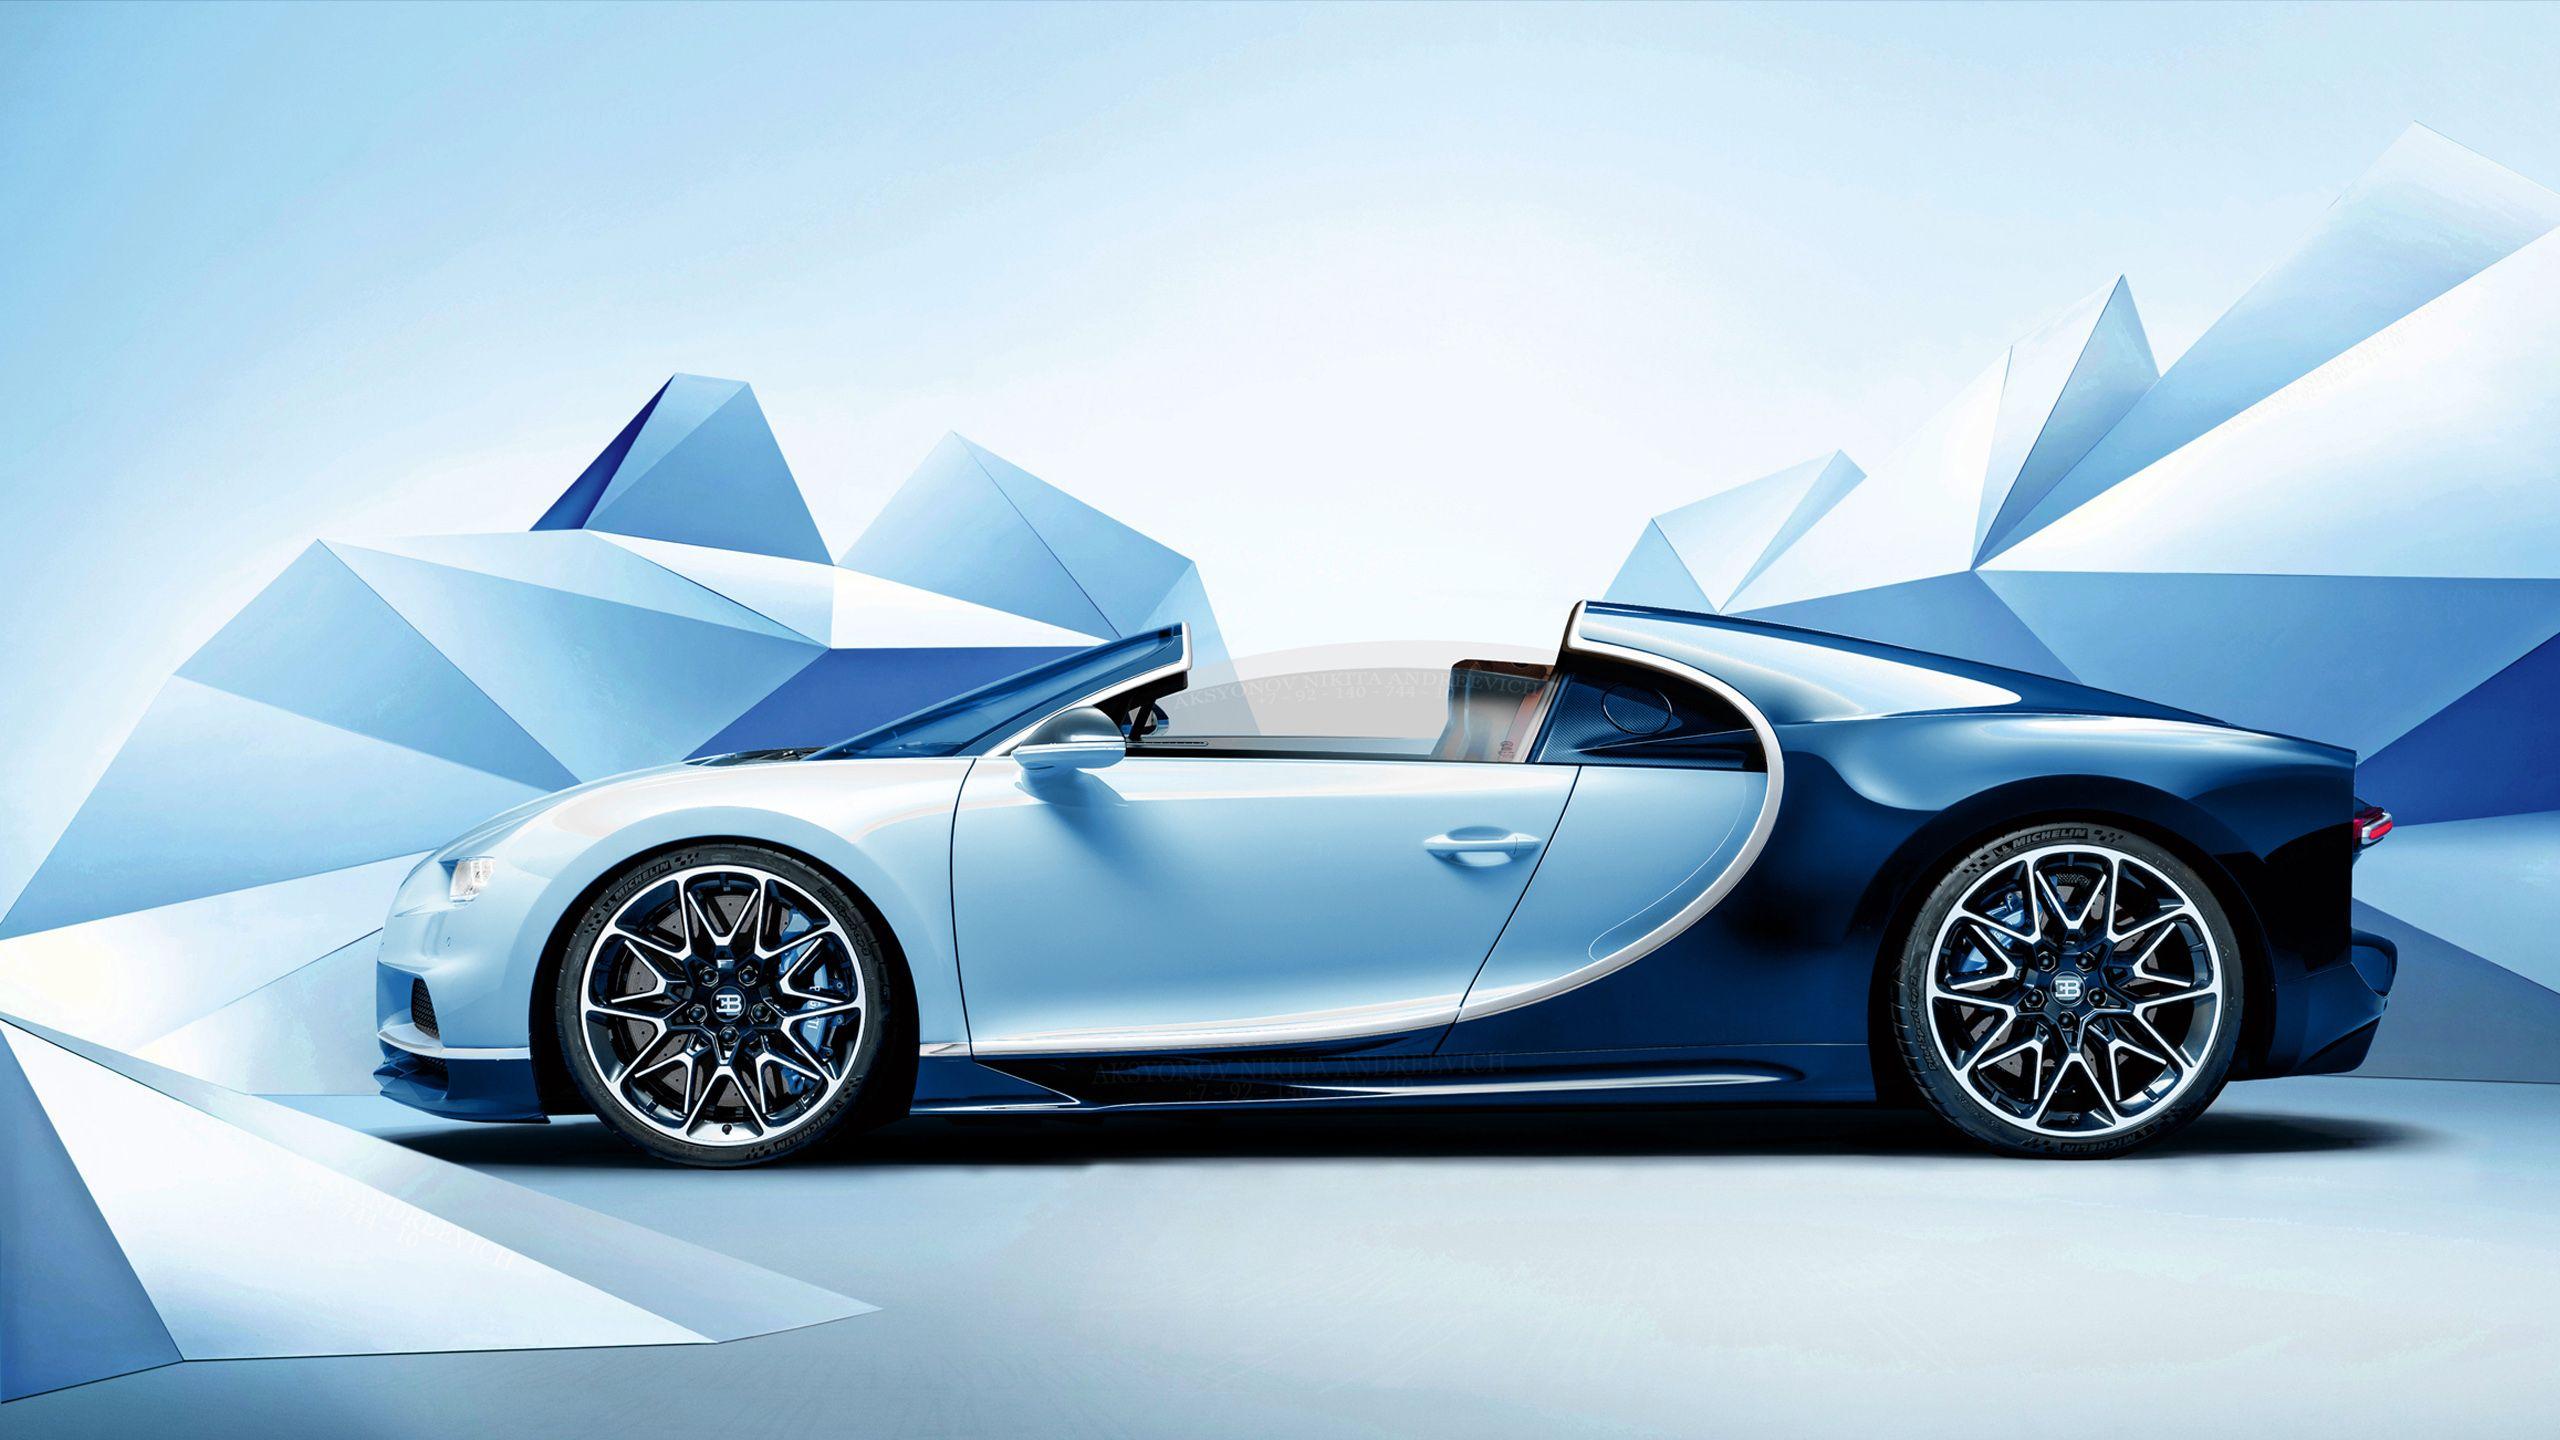 bugatti car background wallpaper 68652